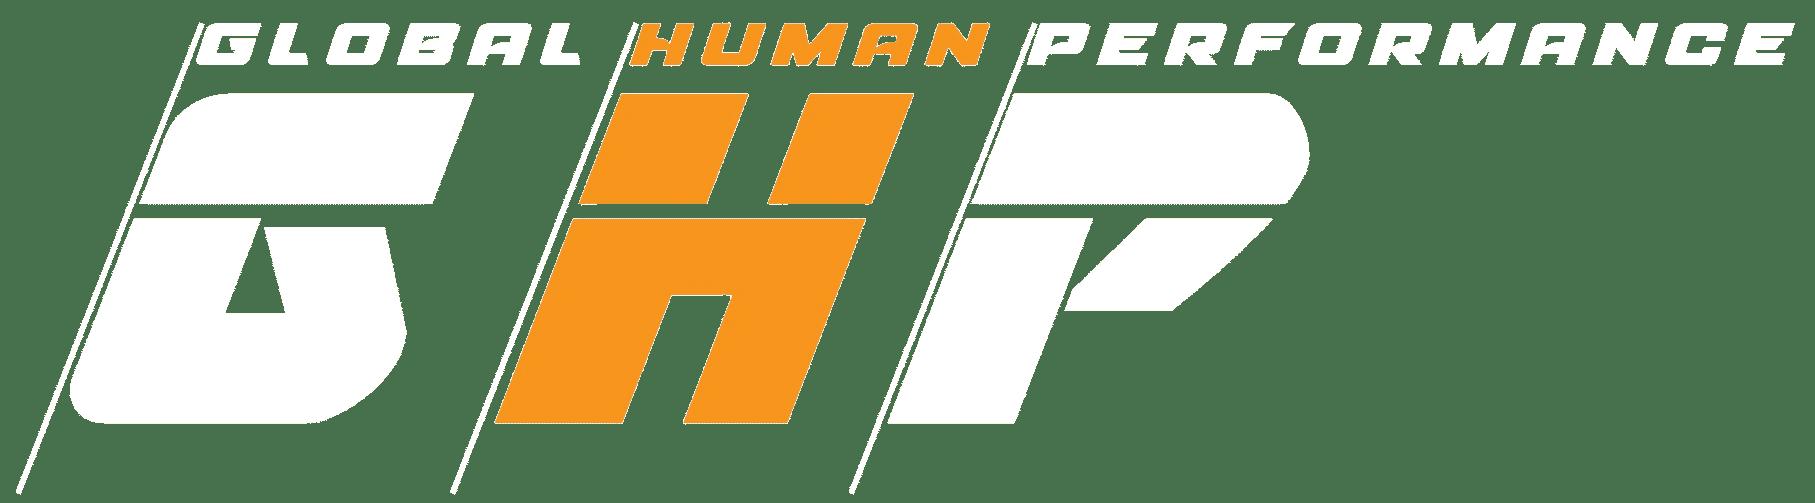 Global Human Performance Logo